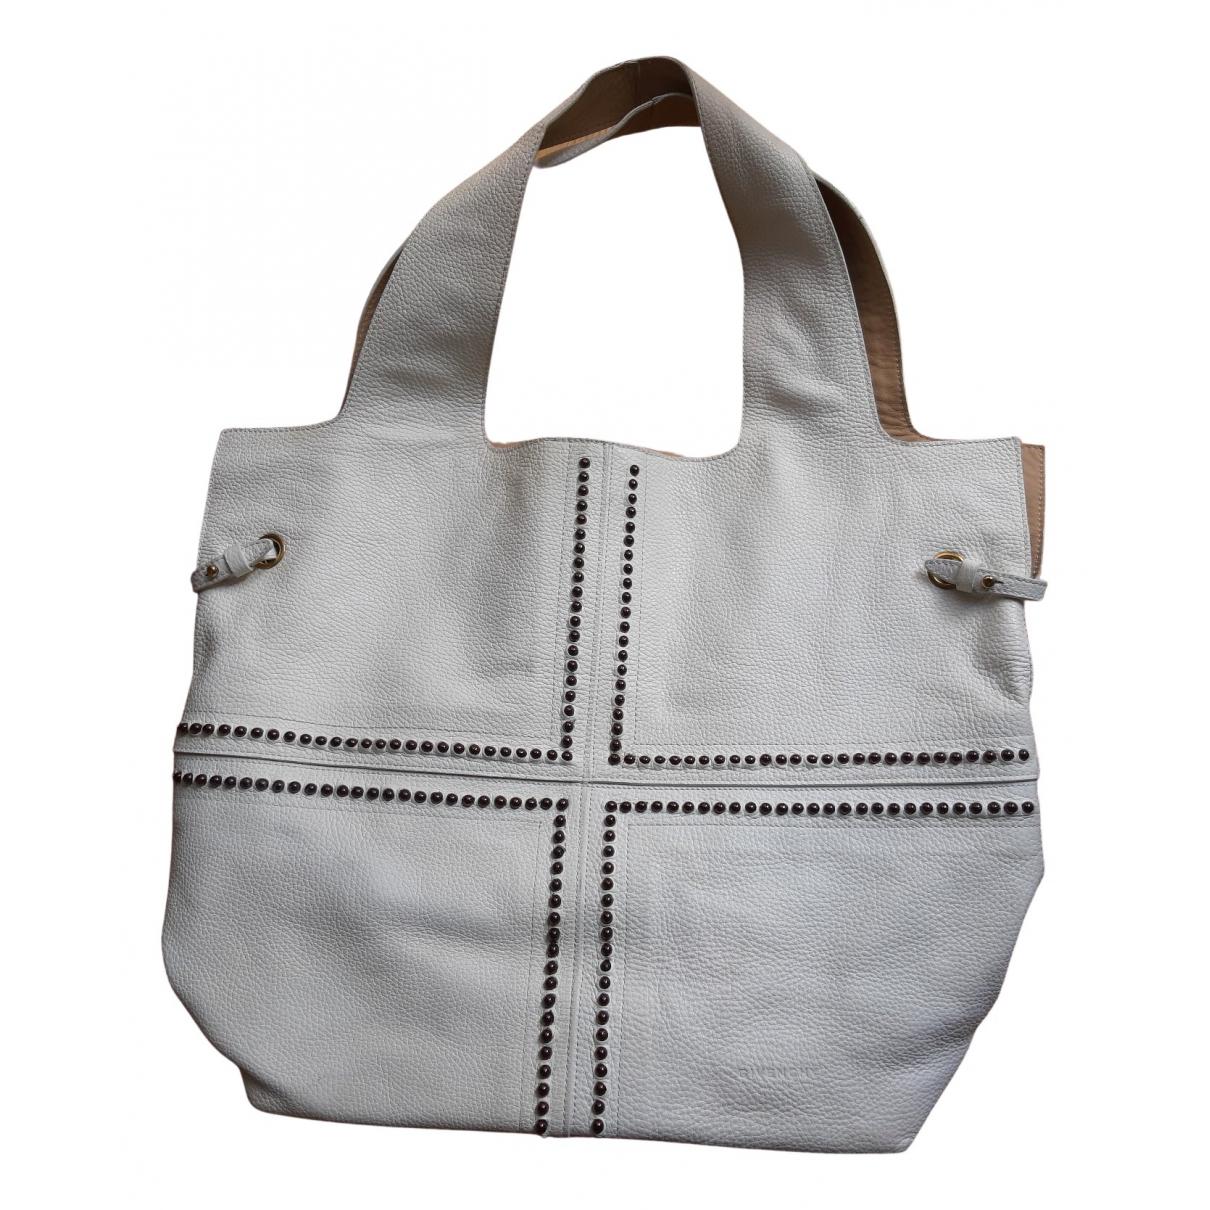 Givenchy Georges V Handtasche in  Weiss Leder